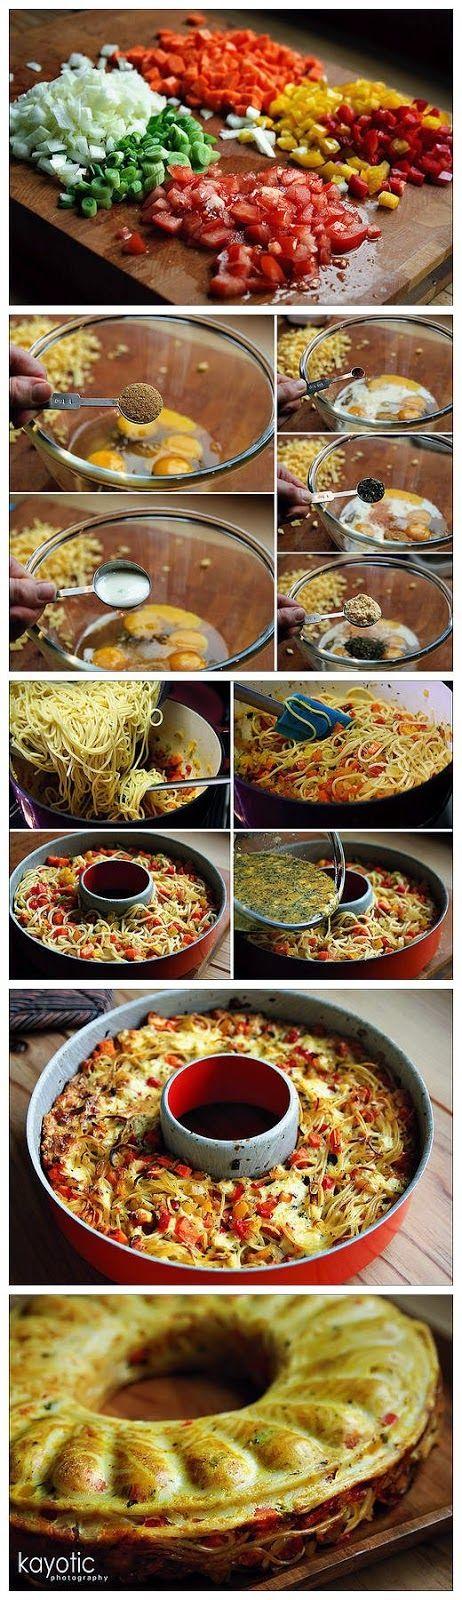 How To Make Spaghetti Pie